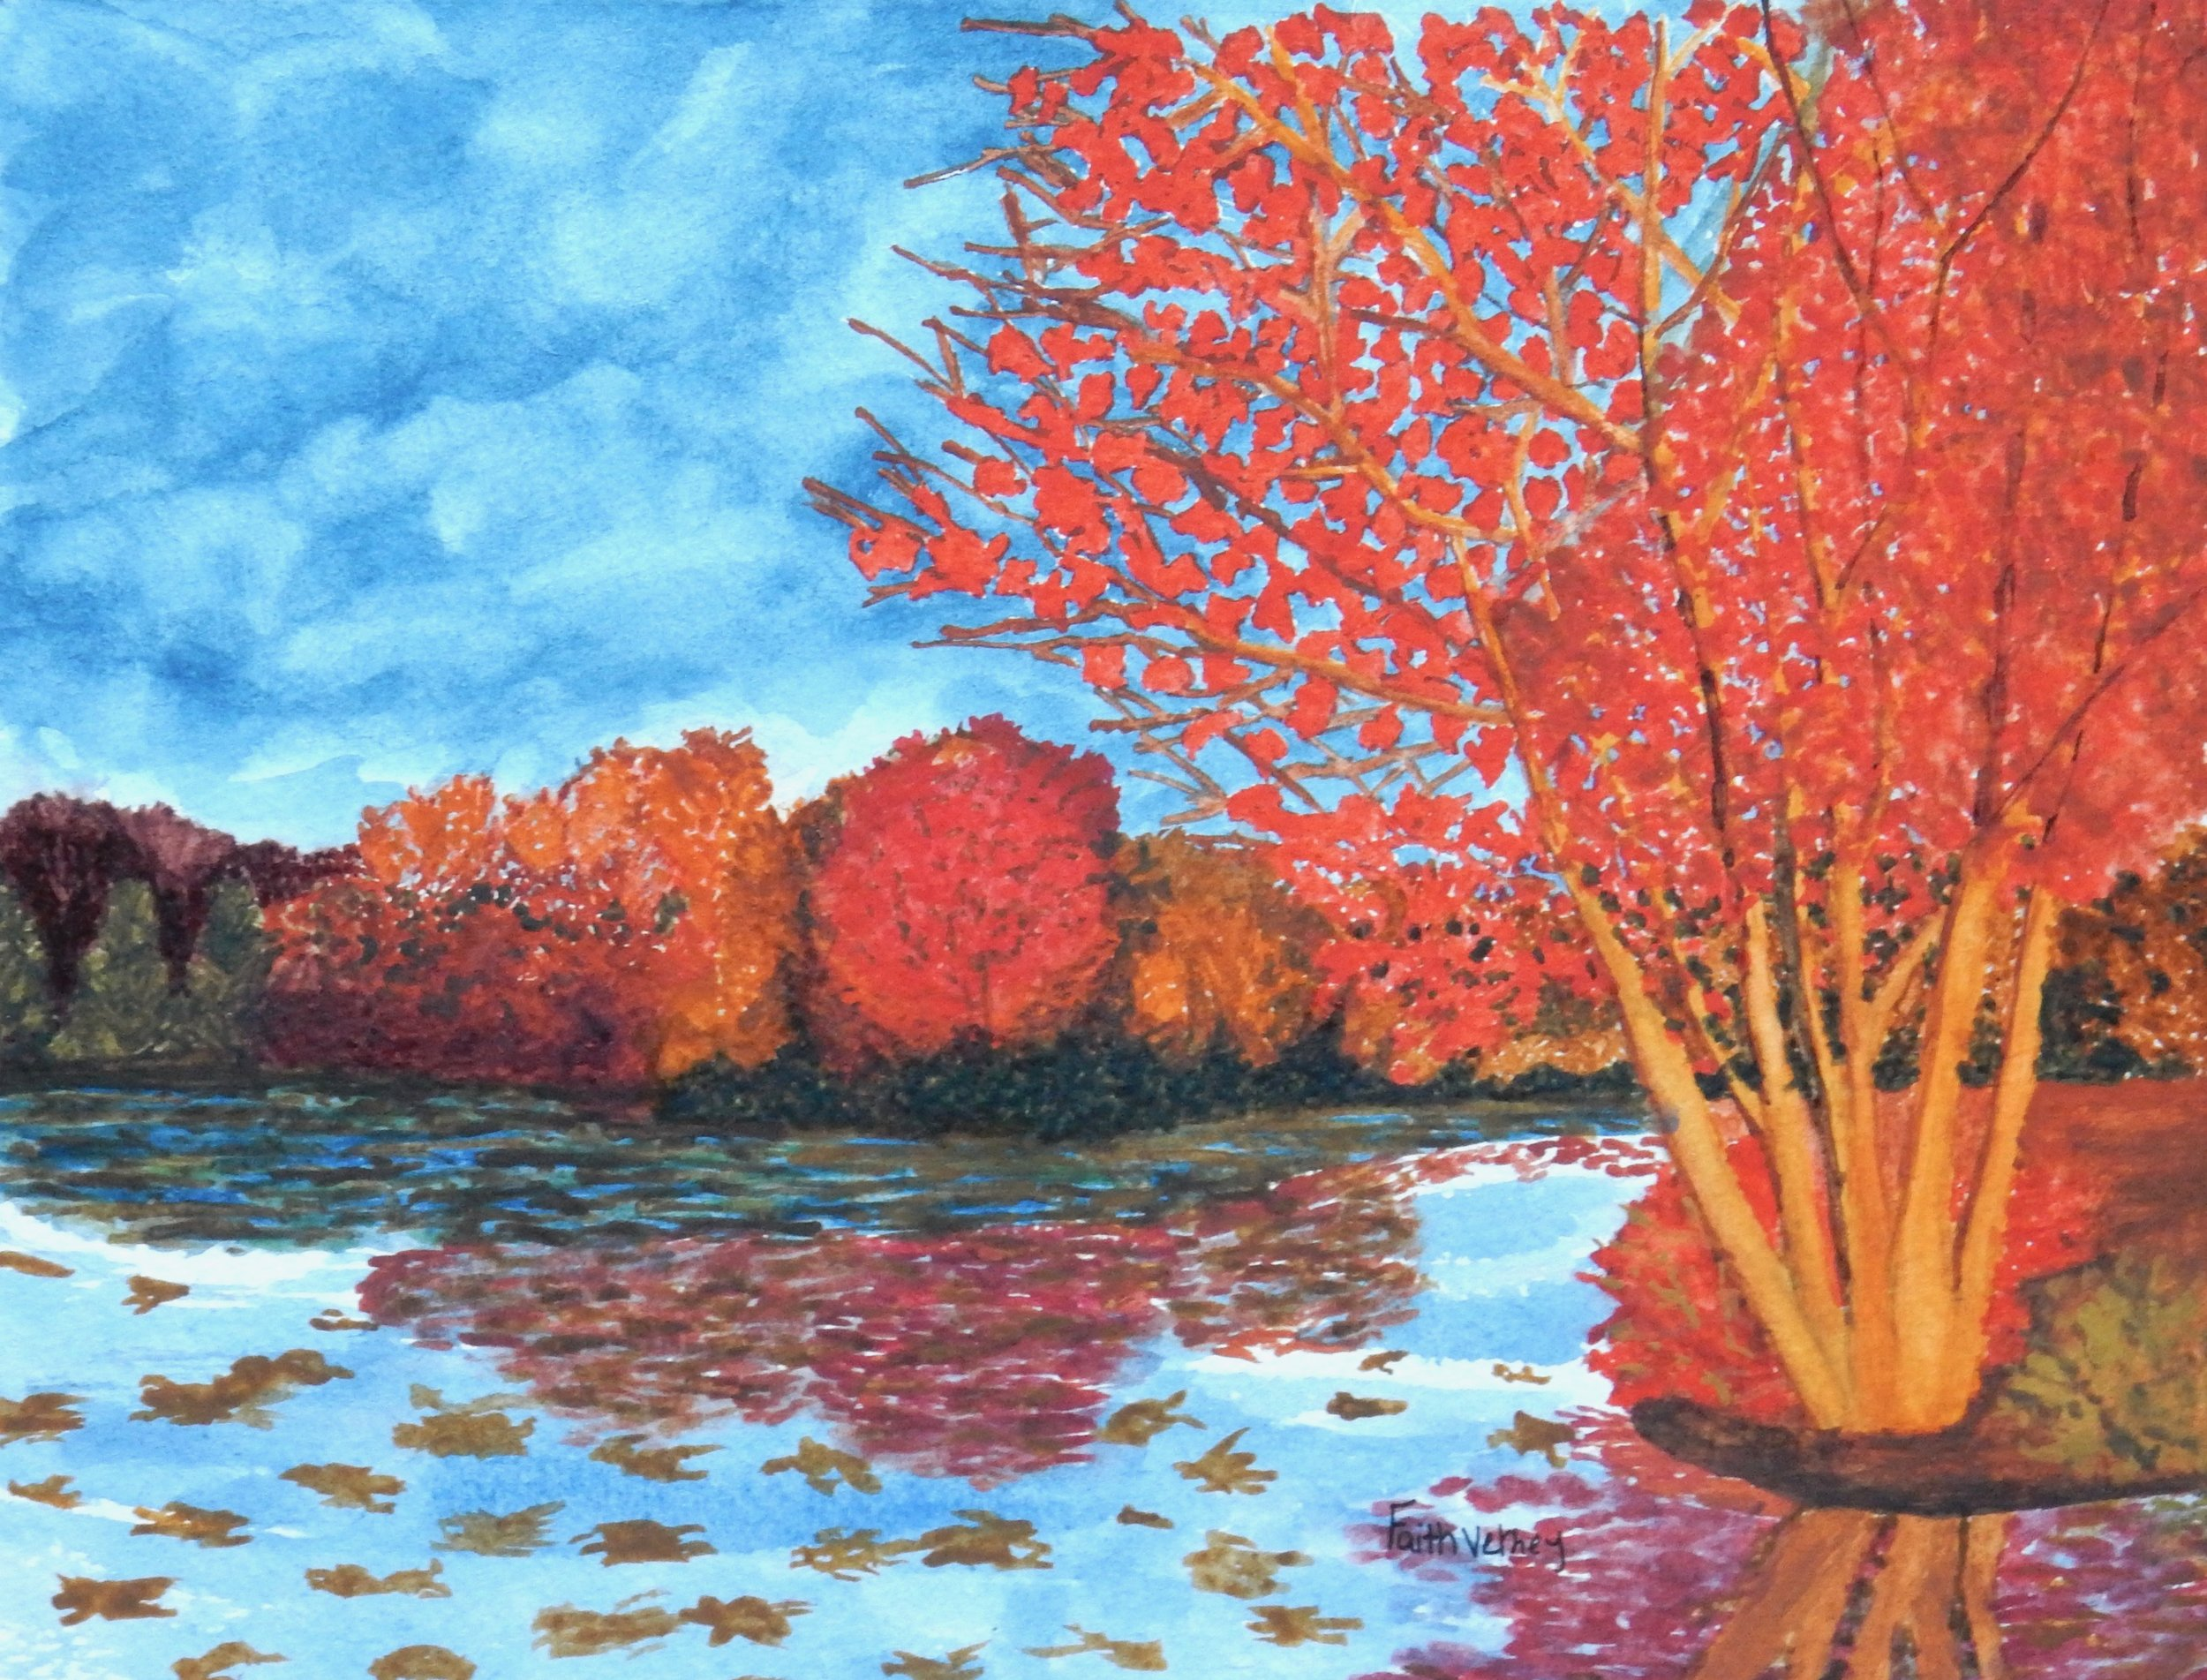 Faith Verney. 17 yrs. 12th grade.watercolor. The Pinnacle of Fall